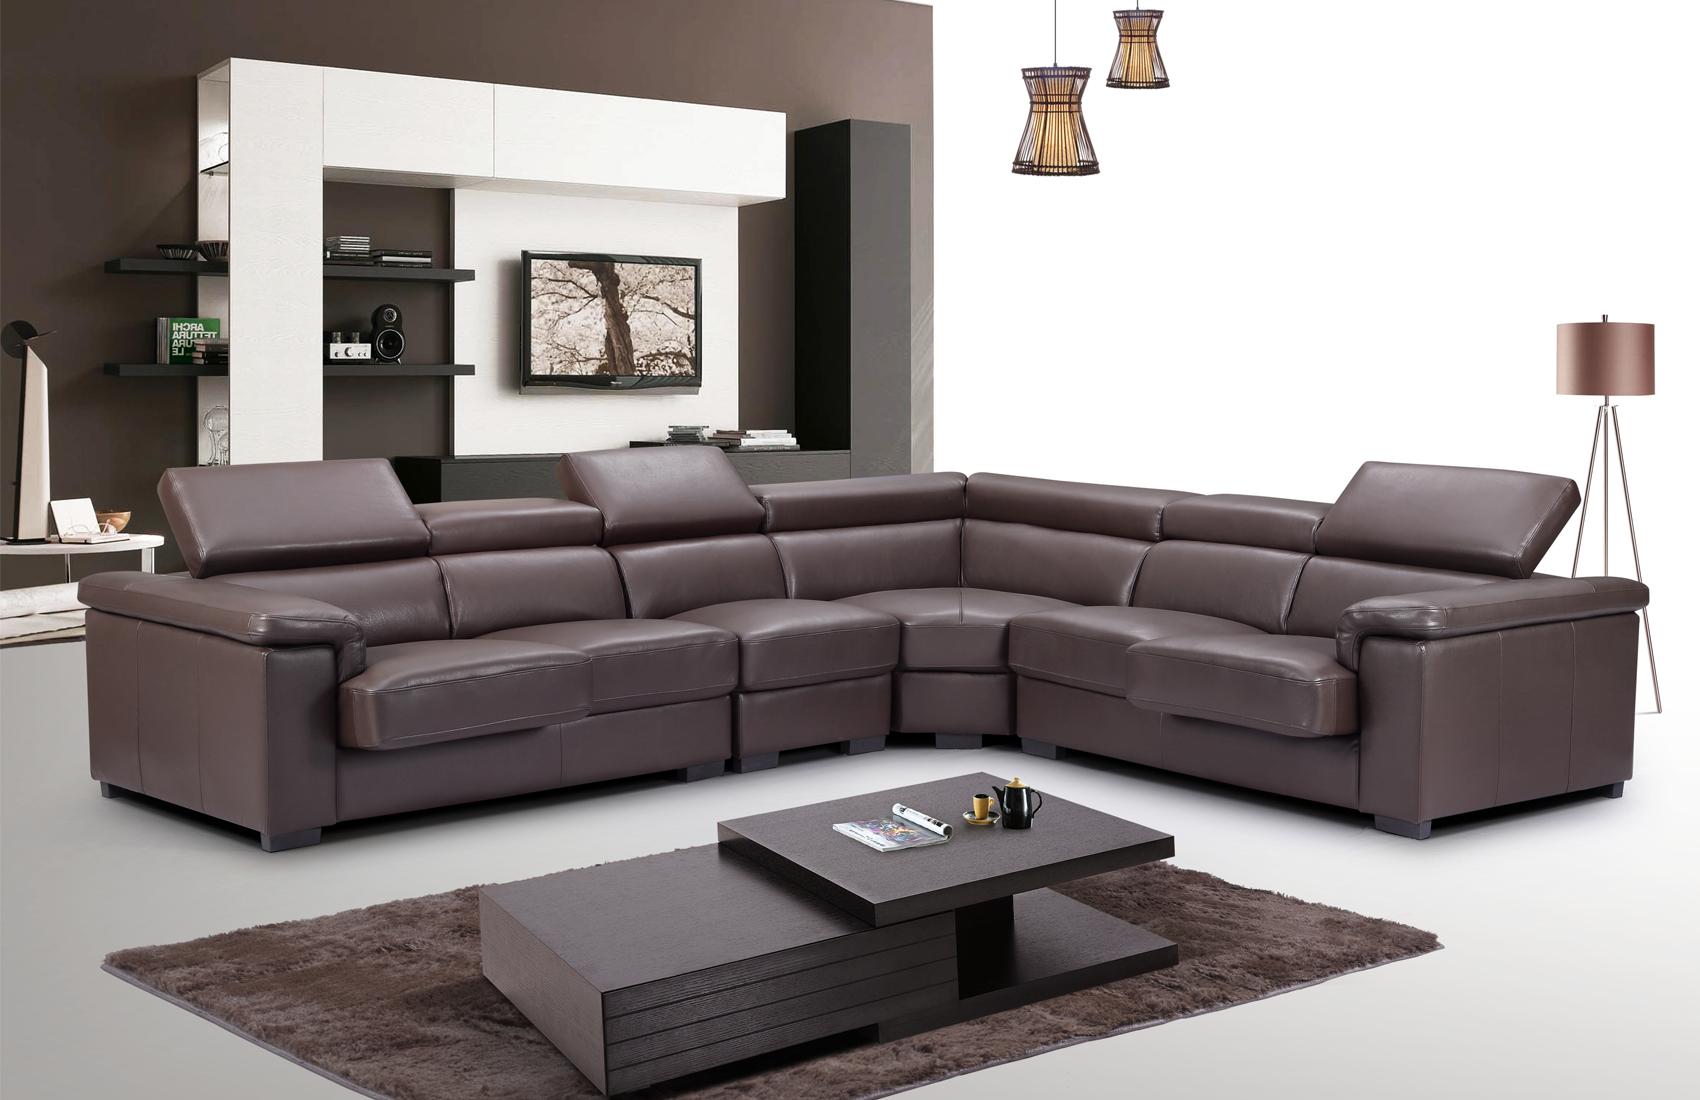 Fabulous 2605 Sectional W Sliding Seats By Esf Creativecarmelina Interior Chair Design Creativecarmelinacom